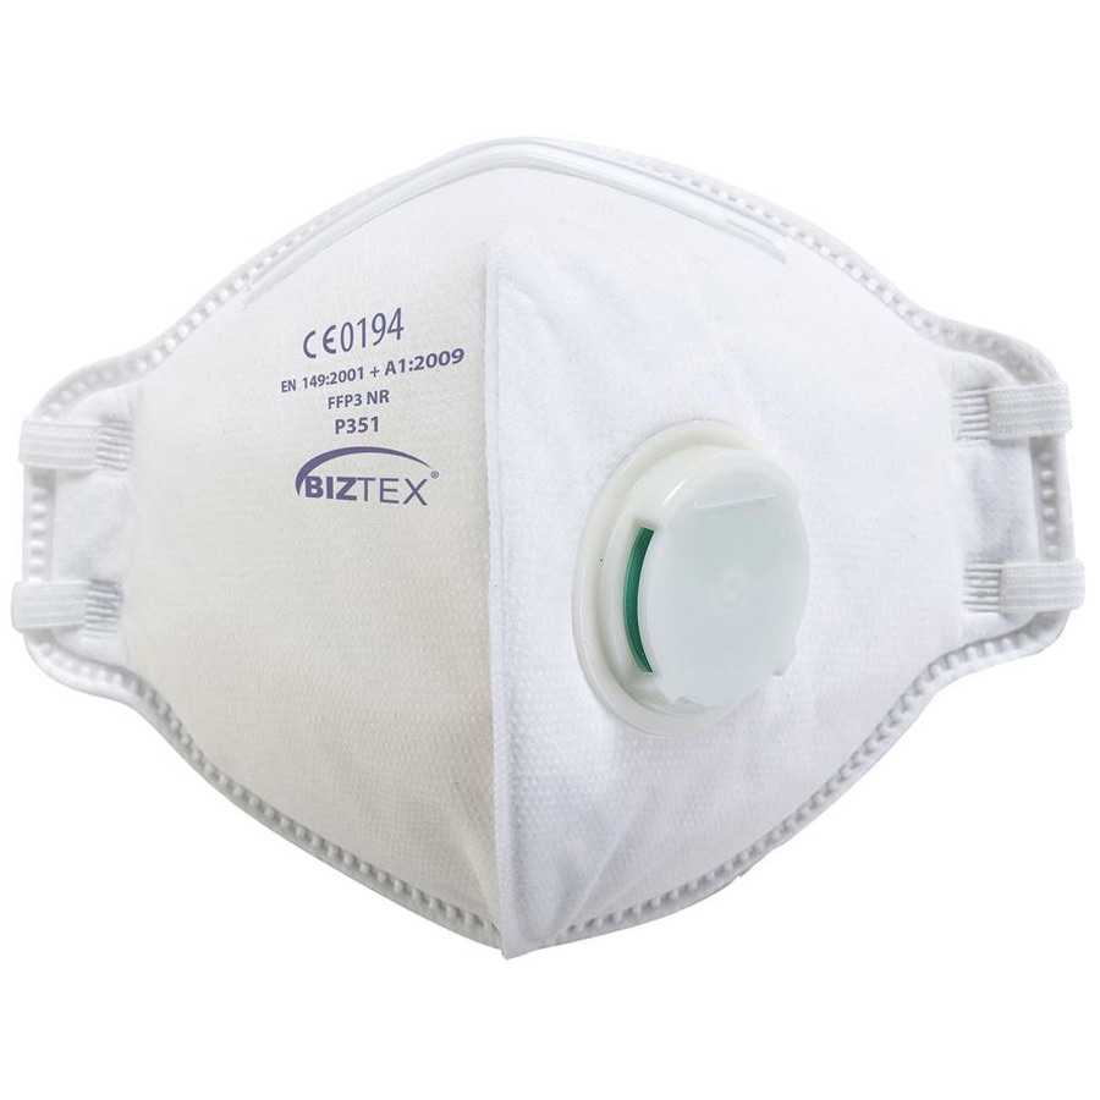 PORTWEST P251 FFP2 valved fold flat respirator 20 masks